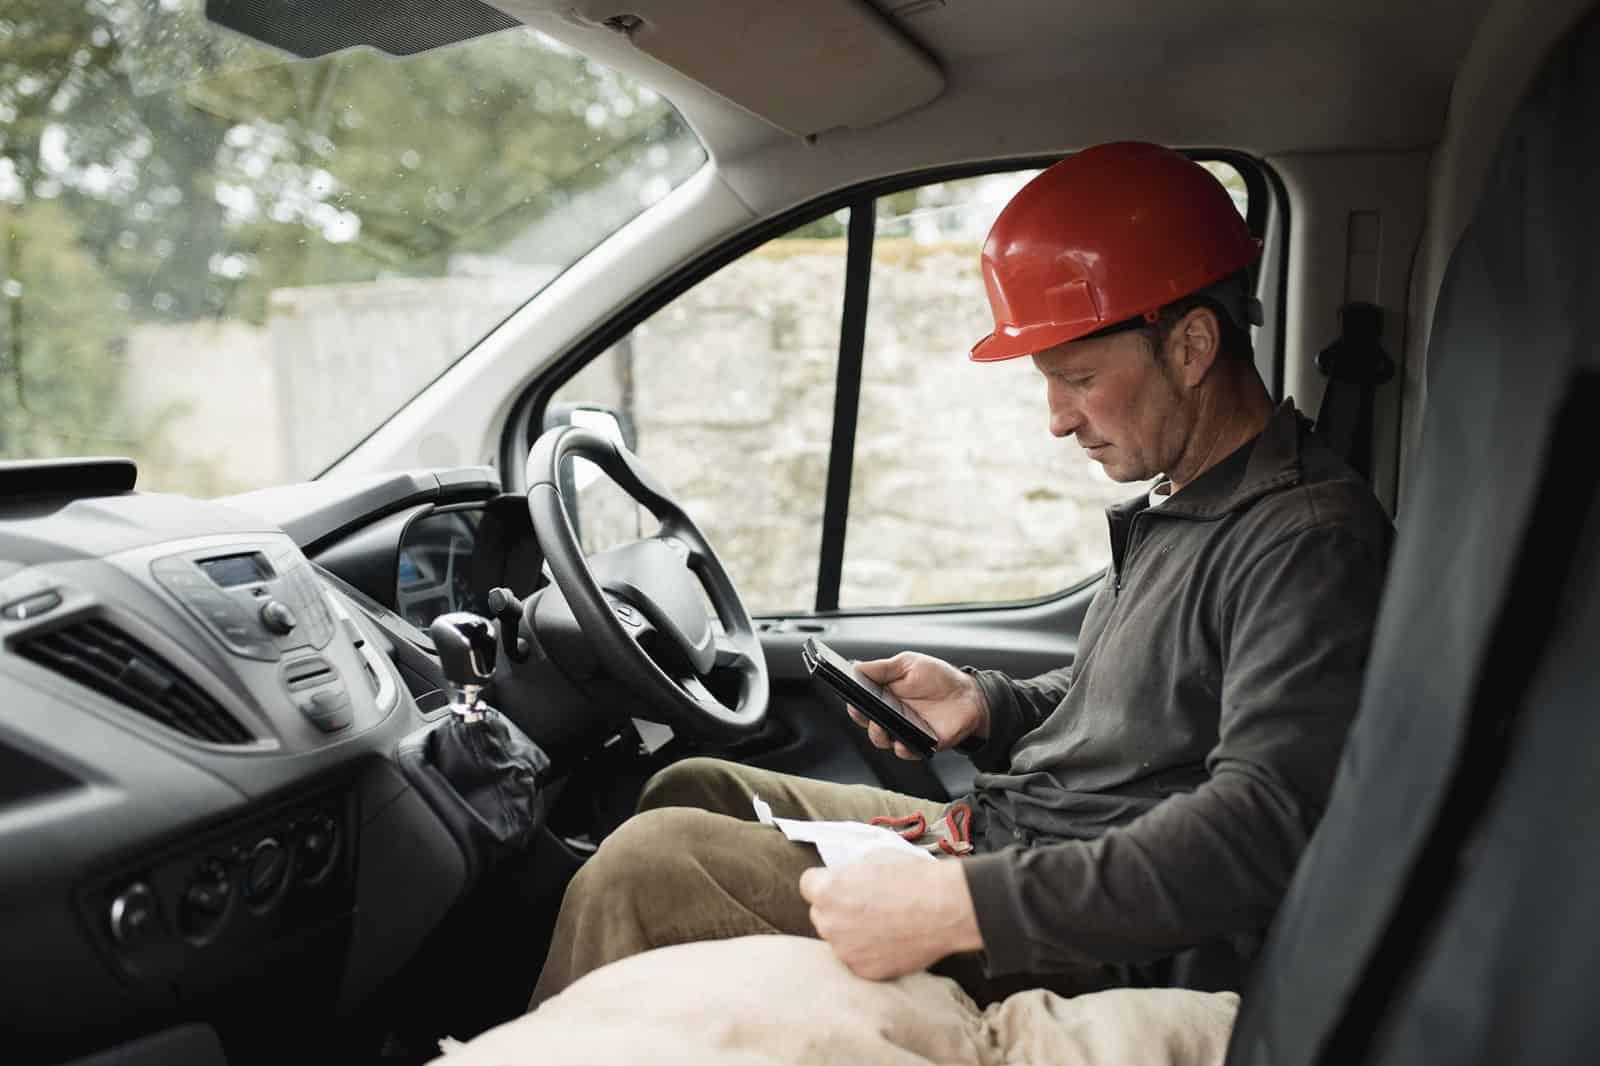 Man in vehicle checking phone